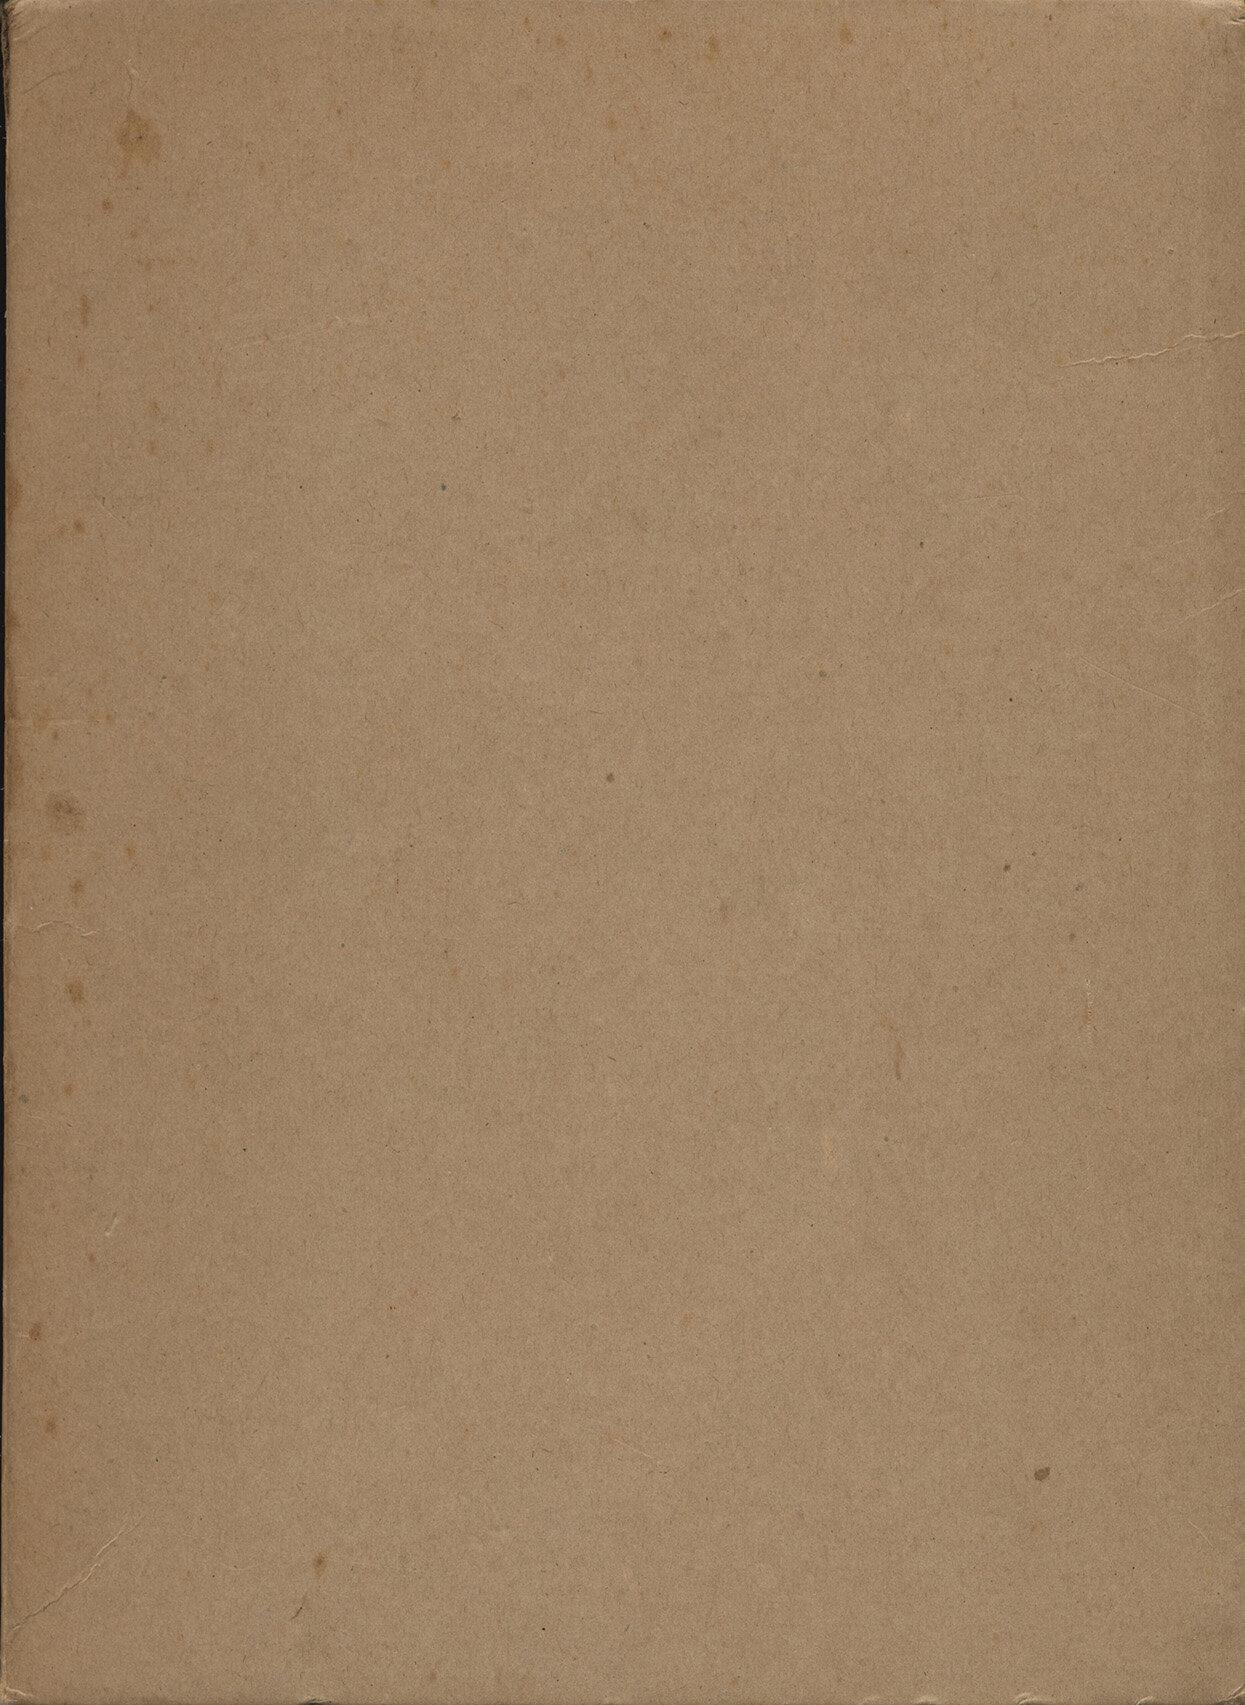 Cover - History of Seikosha